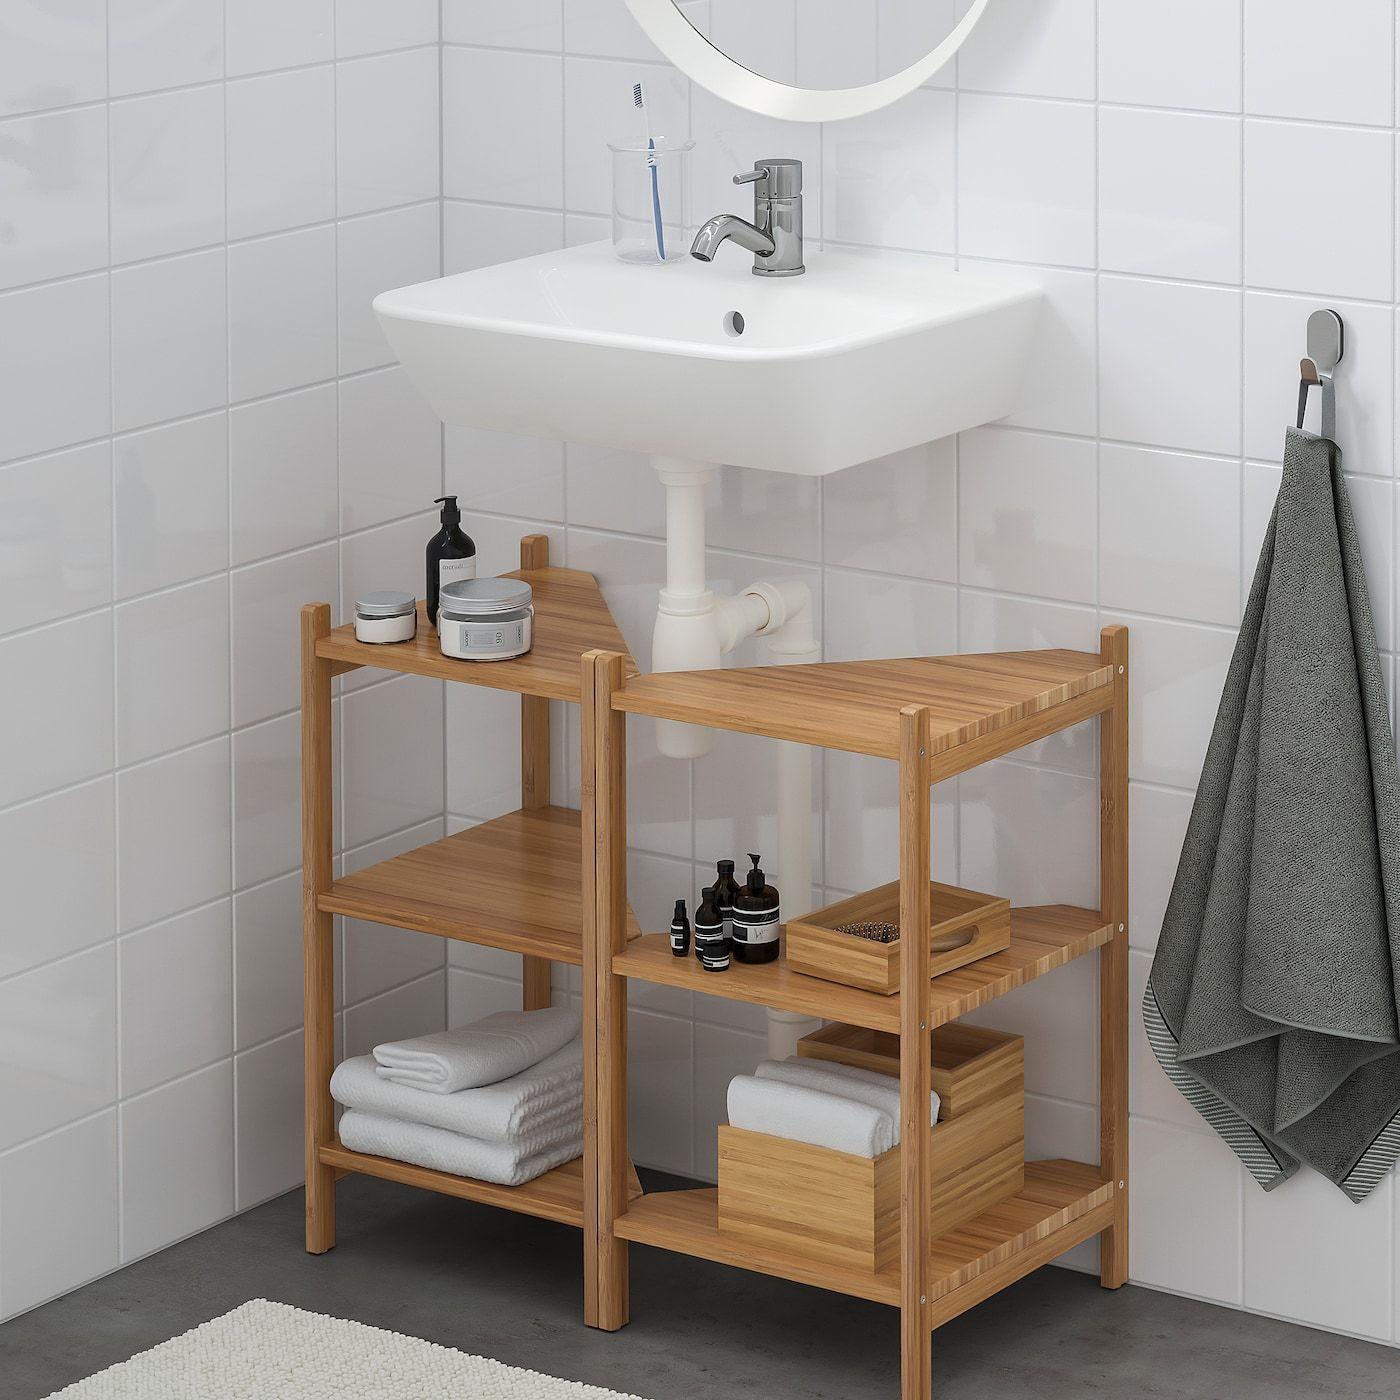 Ragrund Tyngen Sink Base Cabinet With 2 Doors Ikea Bathroom Sink Storage Sink Shelf Bathroom Sink Cabinets